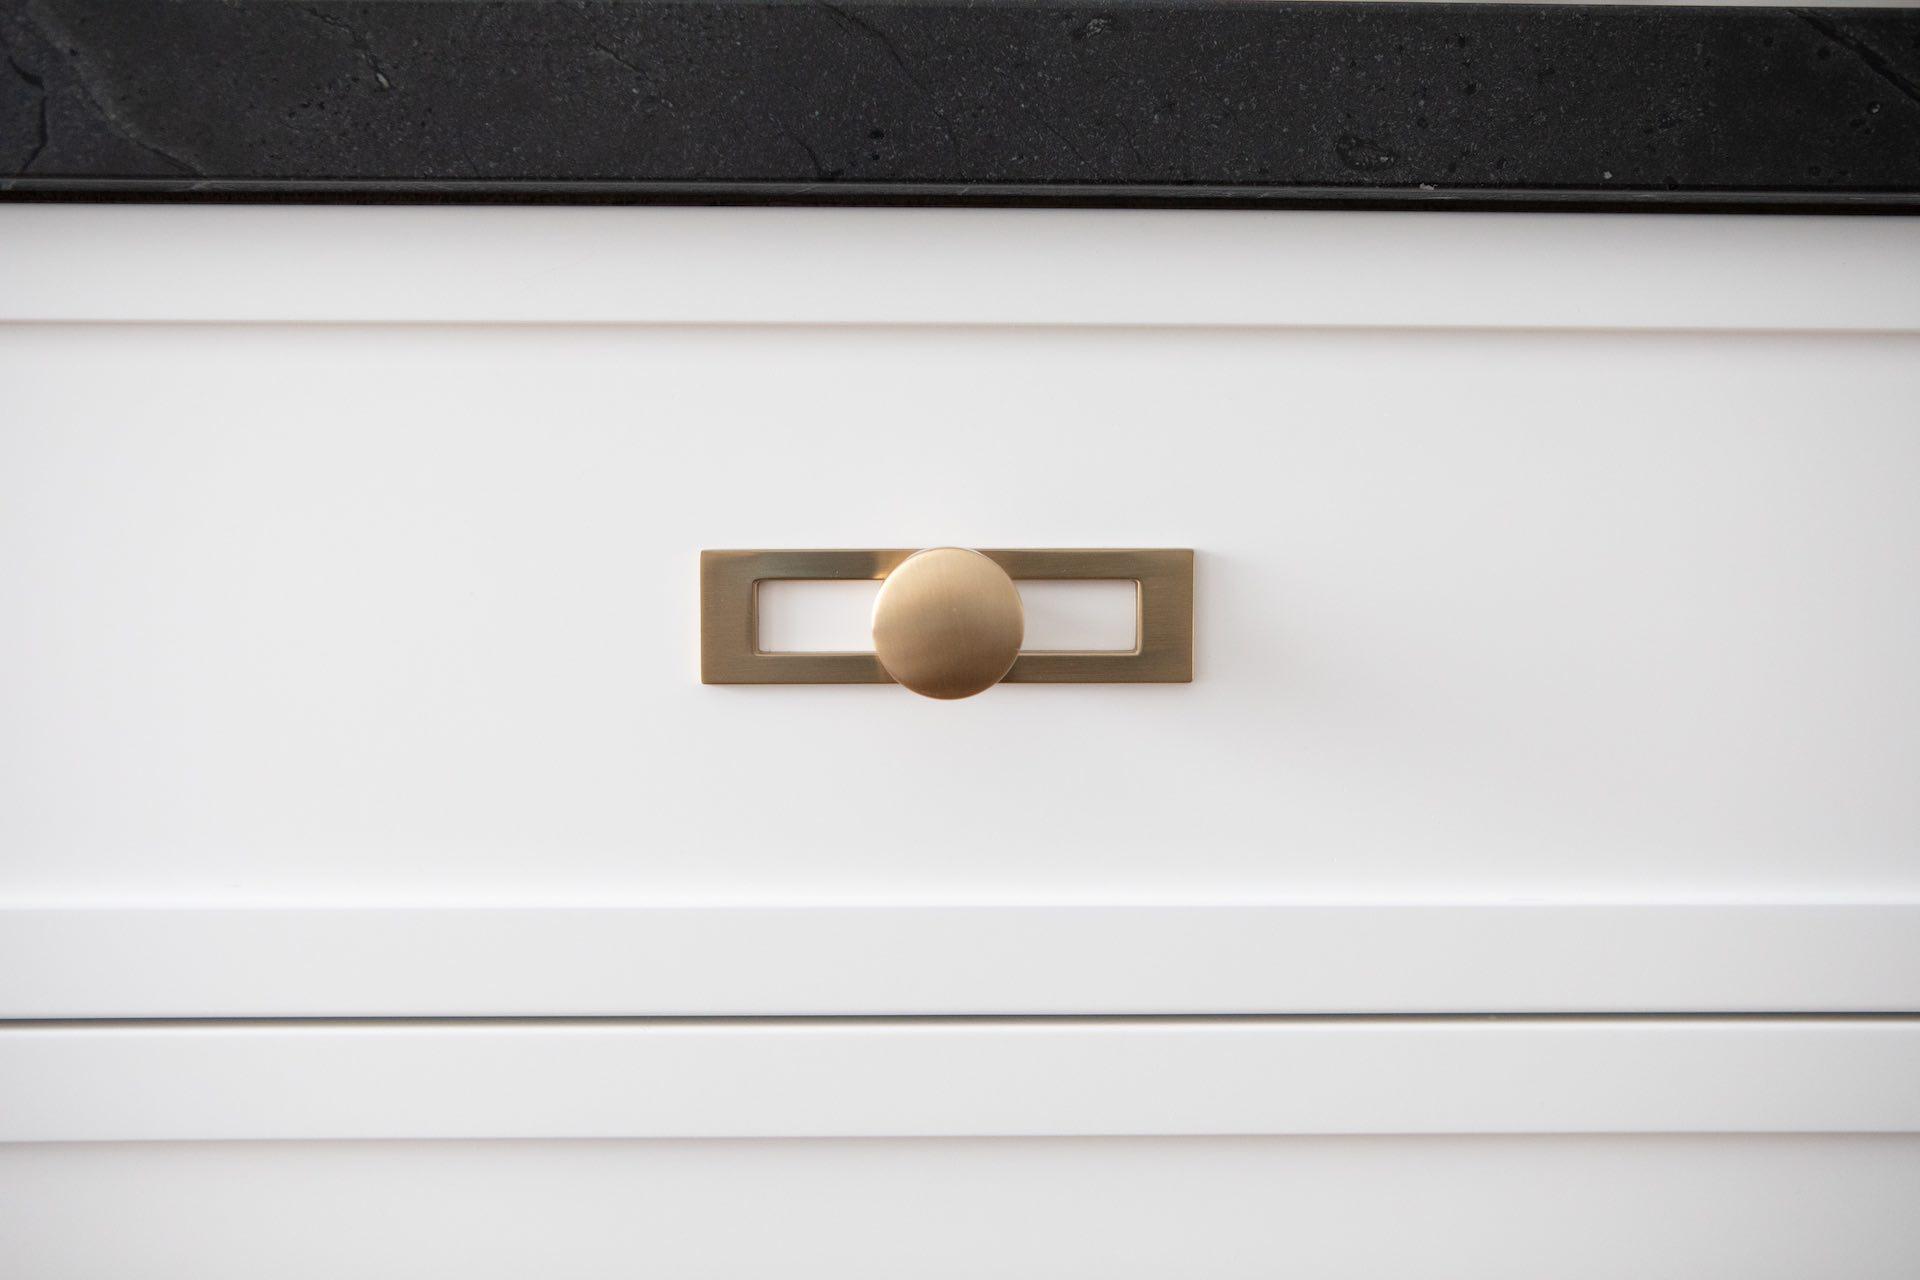 Gold drawer knob